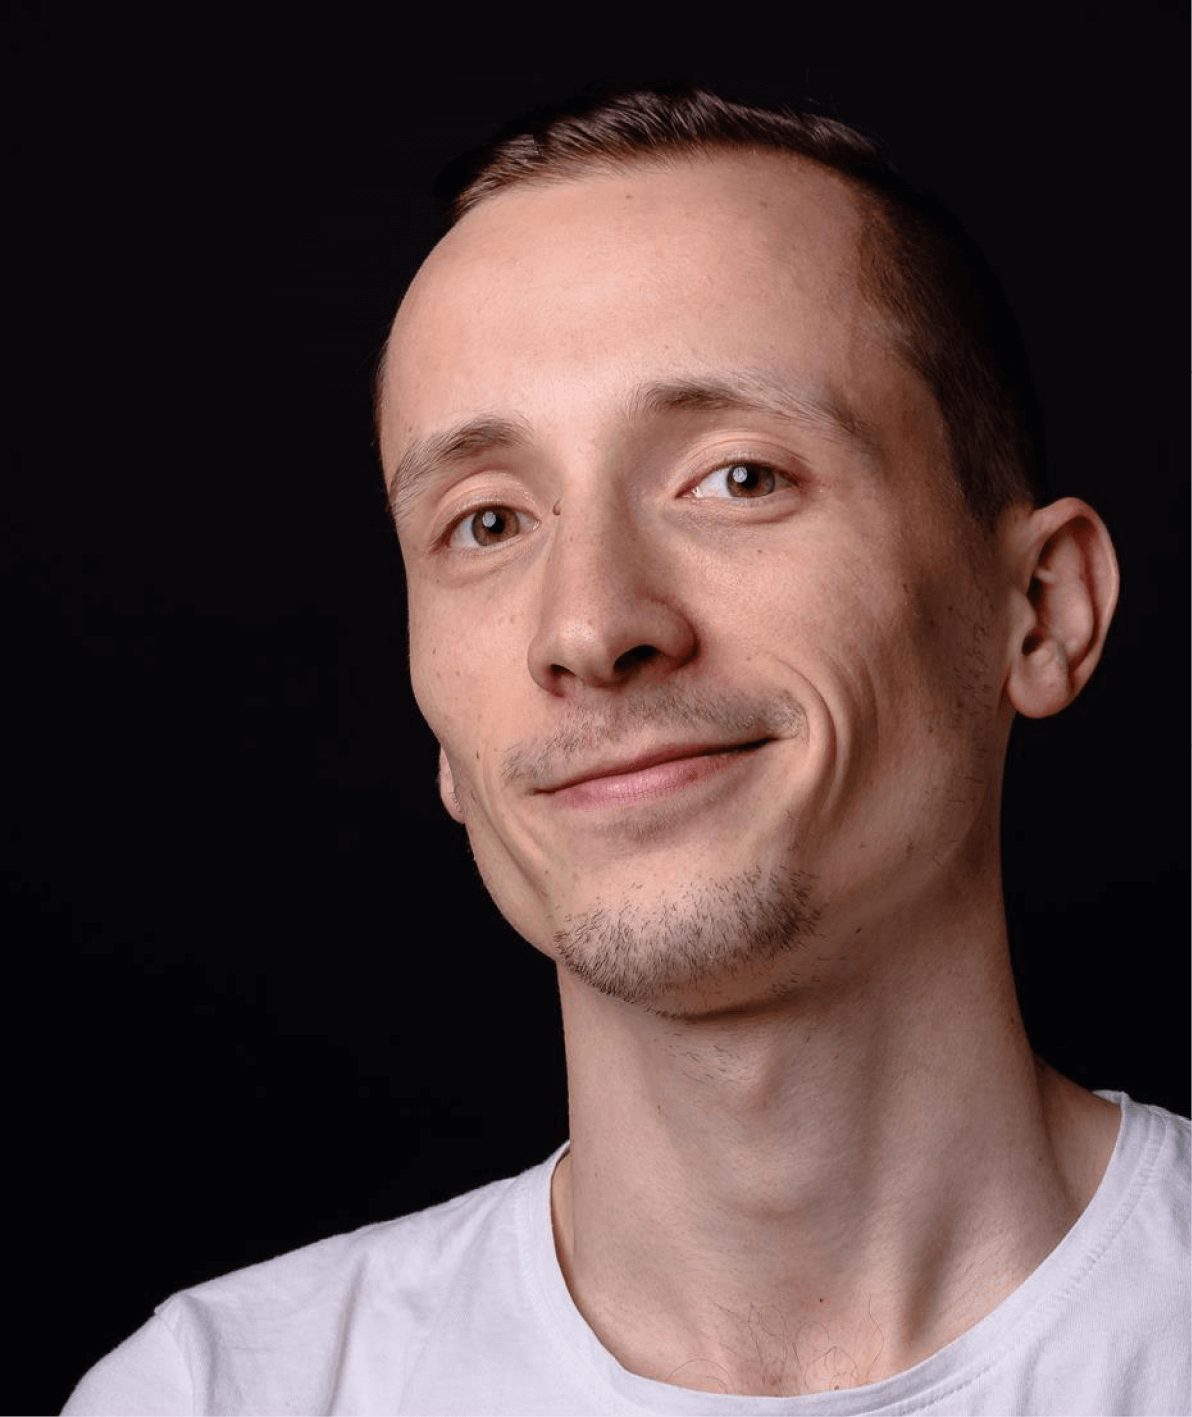 Marek Magoń